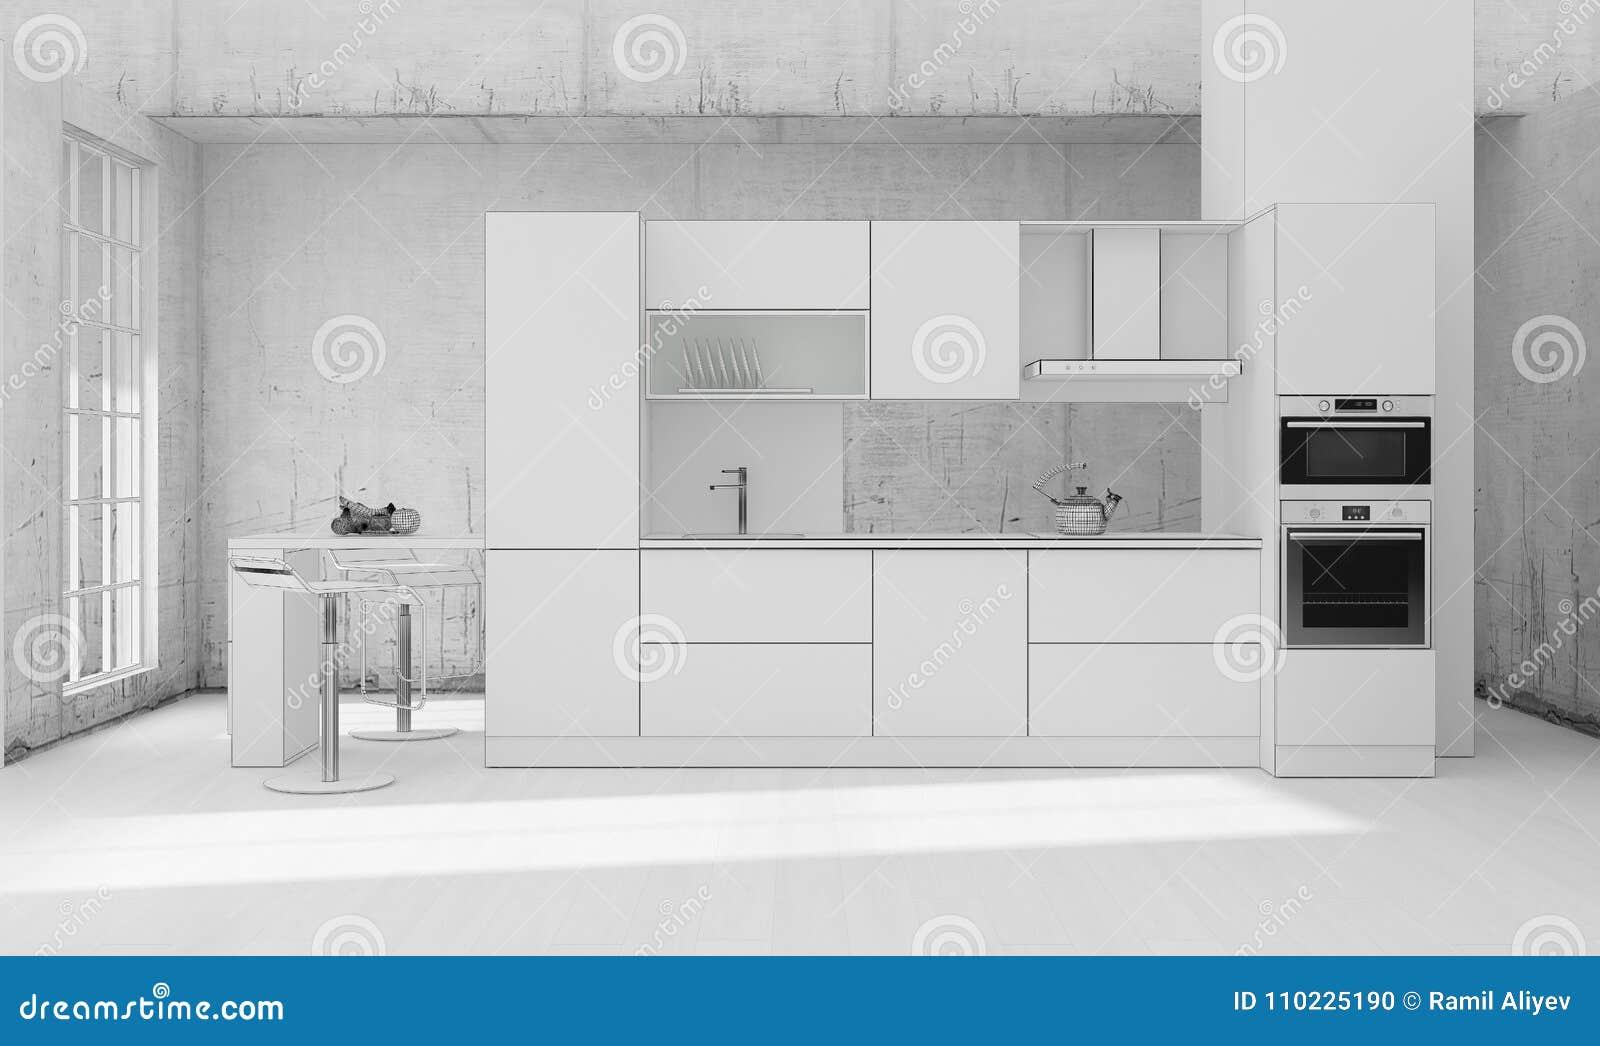 Representaci N Interior De La Rejilla 3d De La Cocina Stock De  # Muebles Rejilla